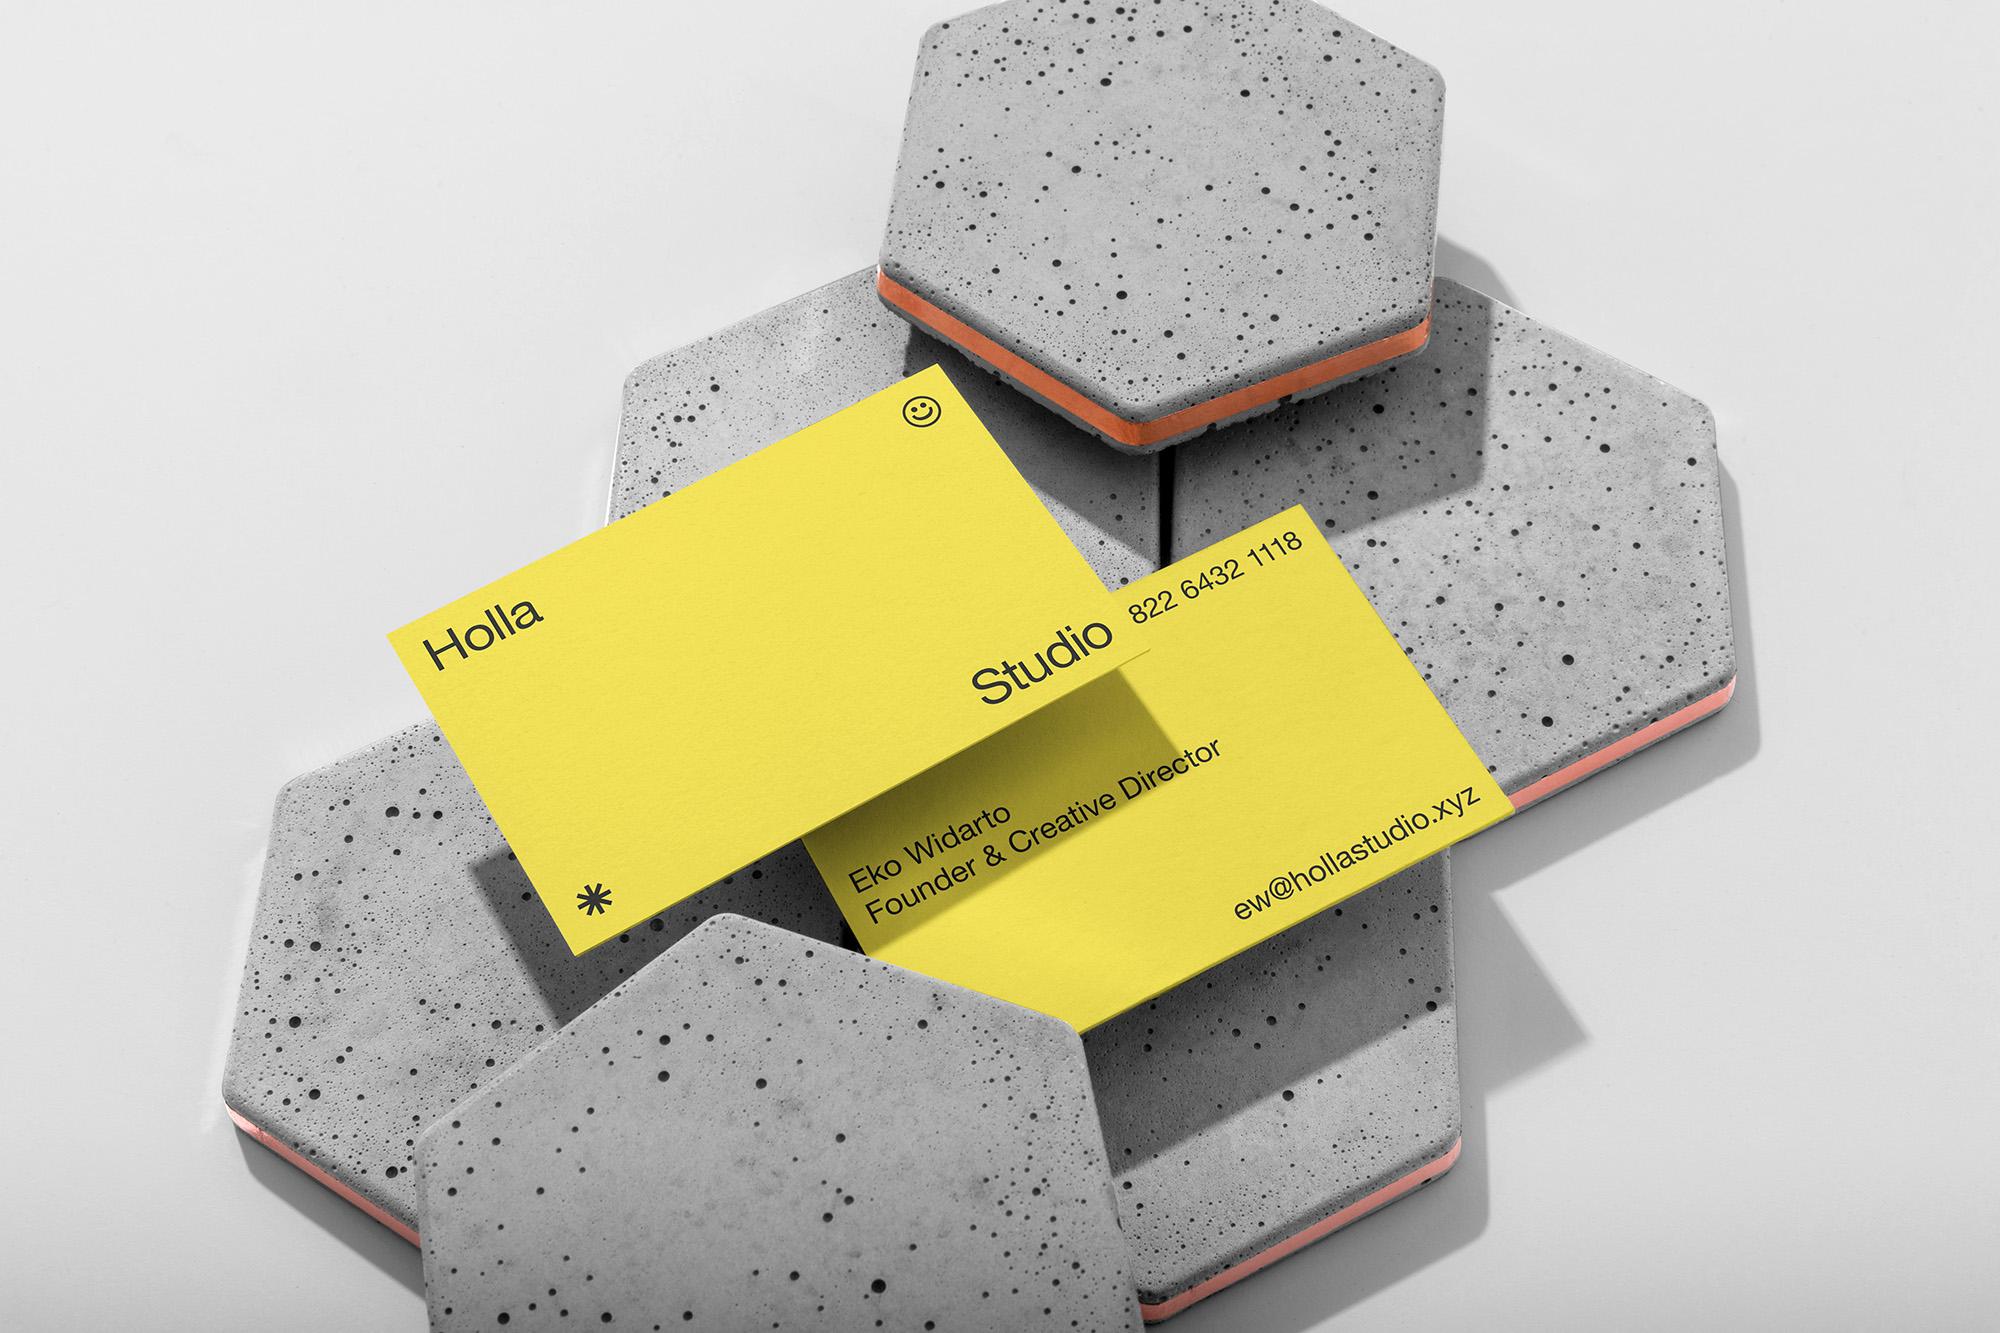 Holla Studio Identity Designed by Widarto Impact